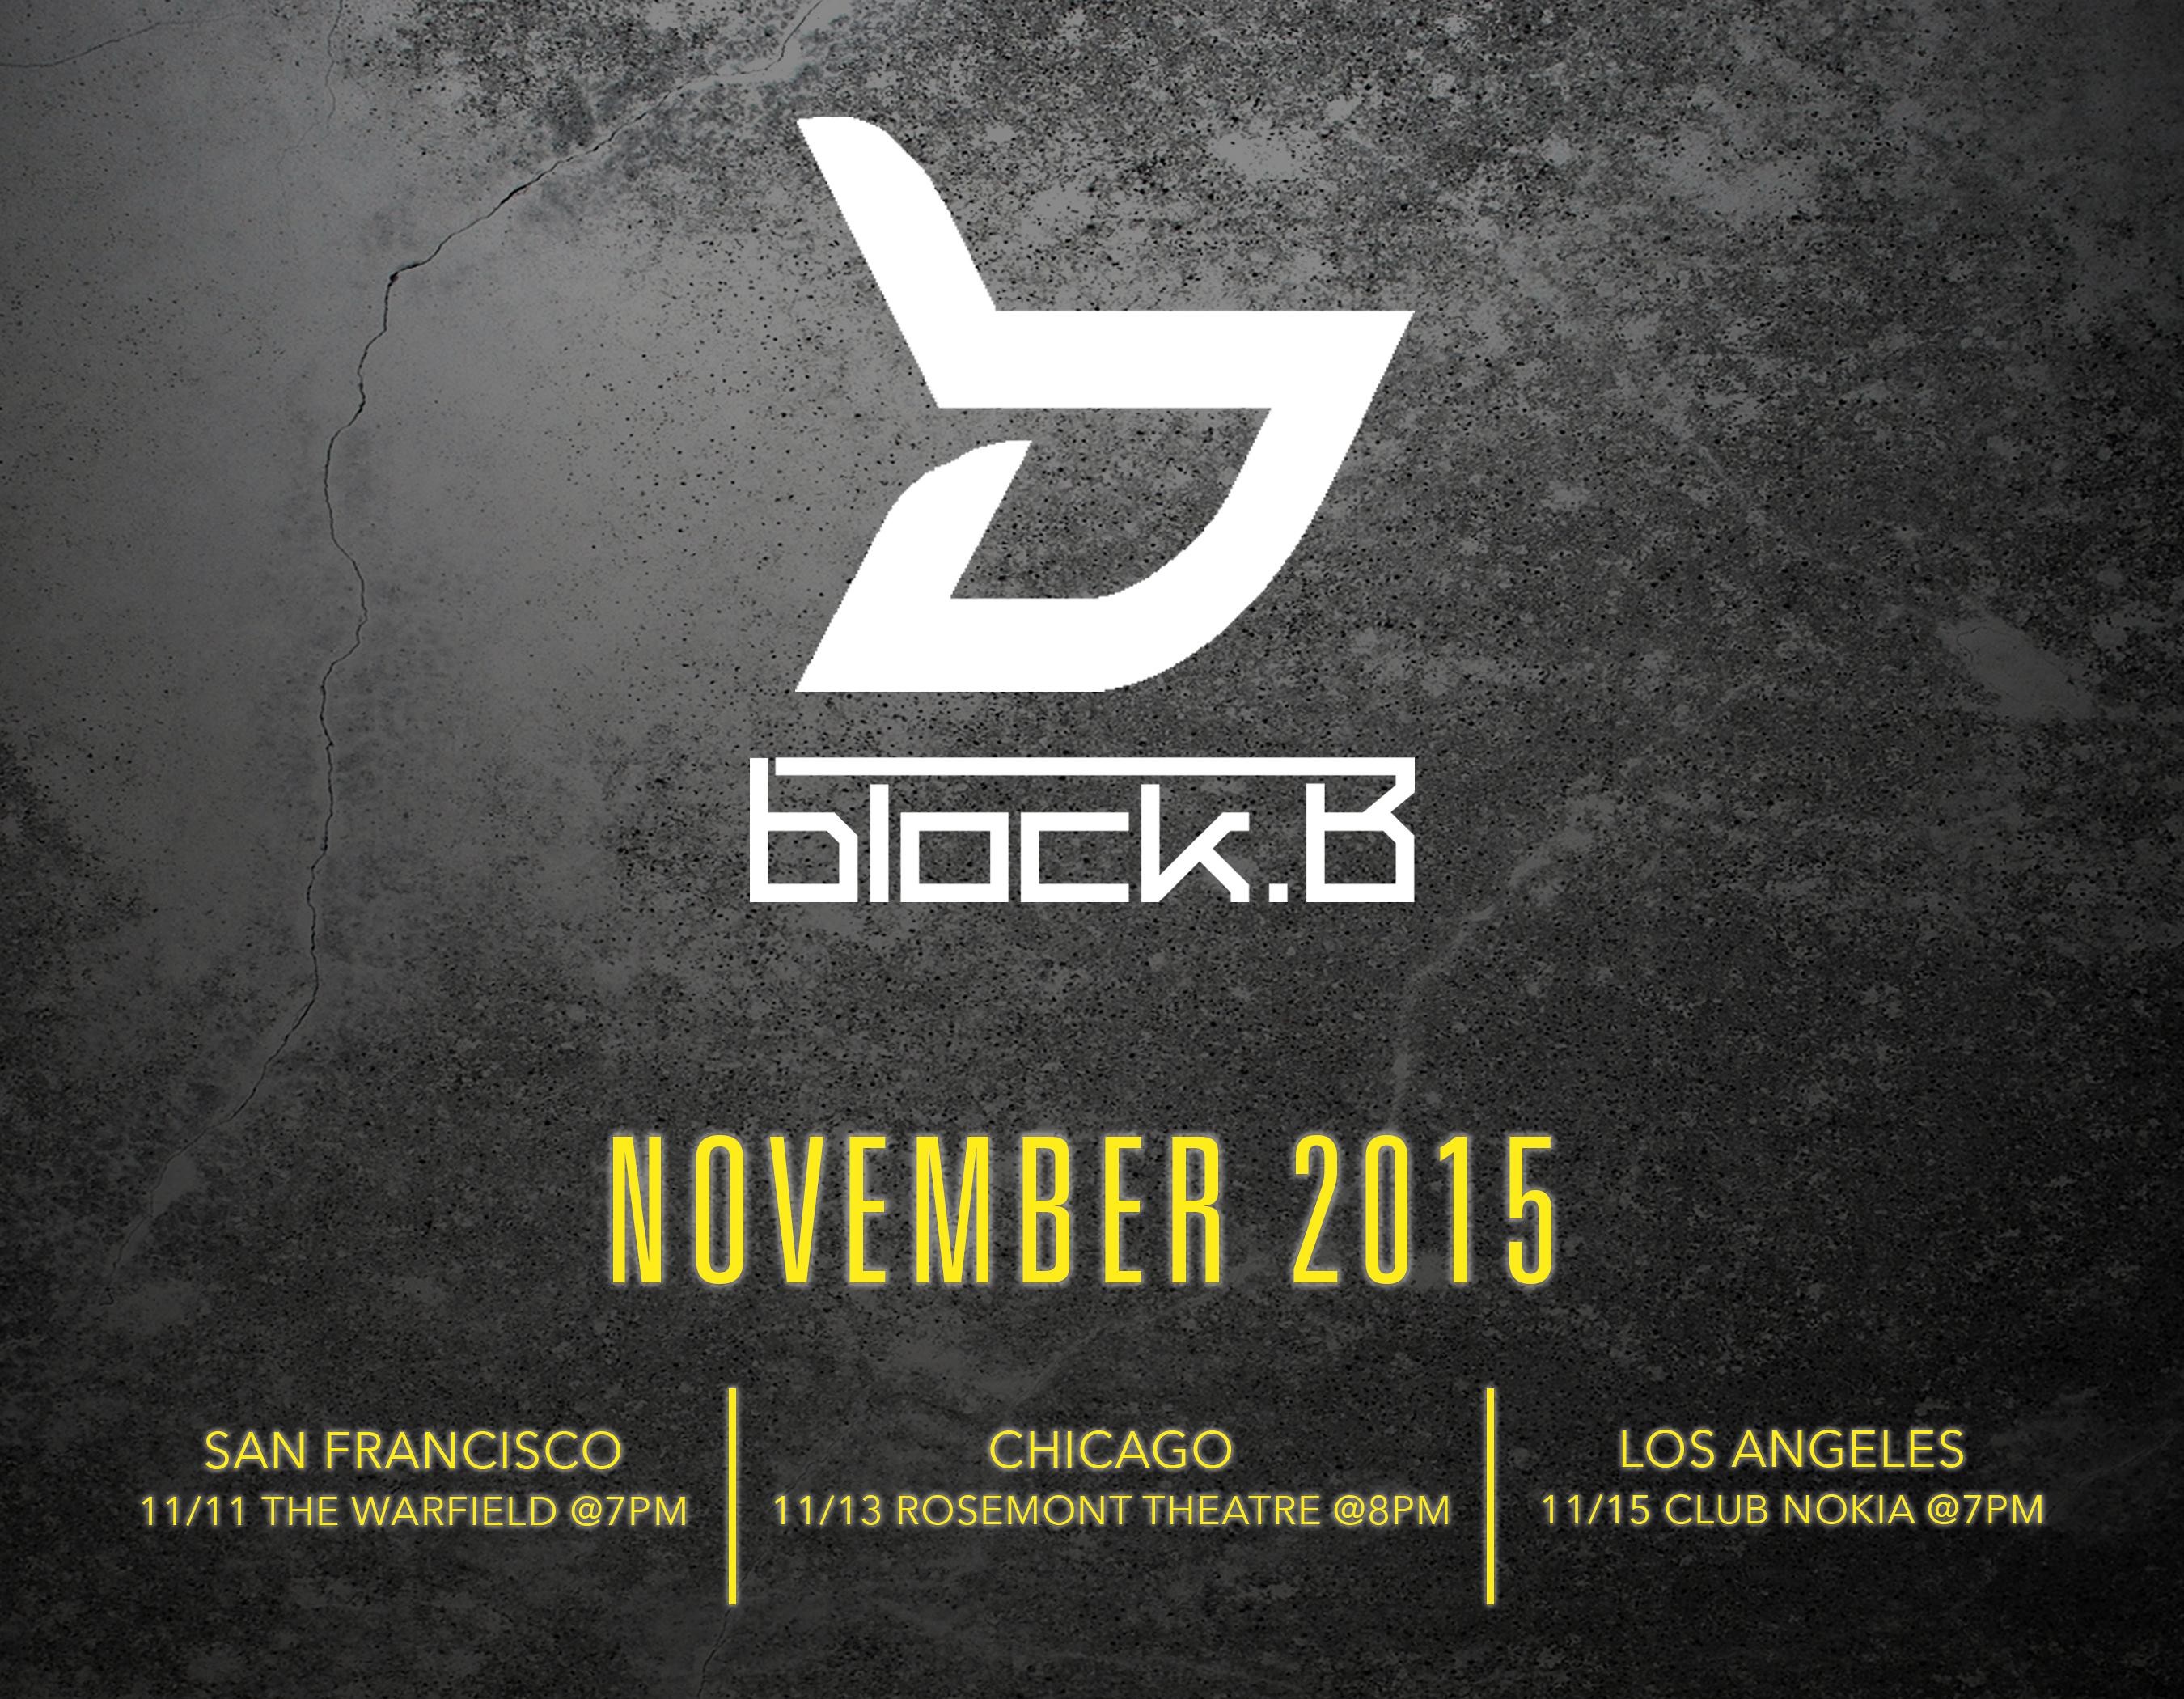 BlockB_Promo_Image